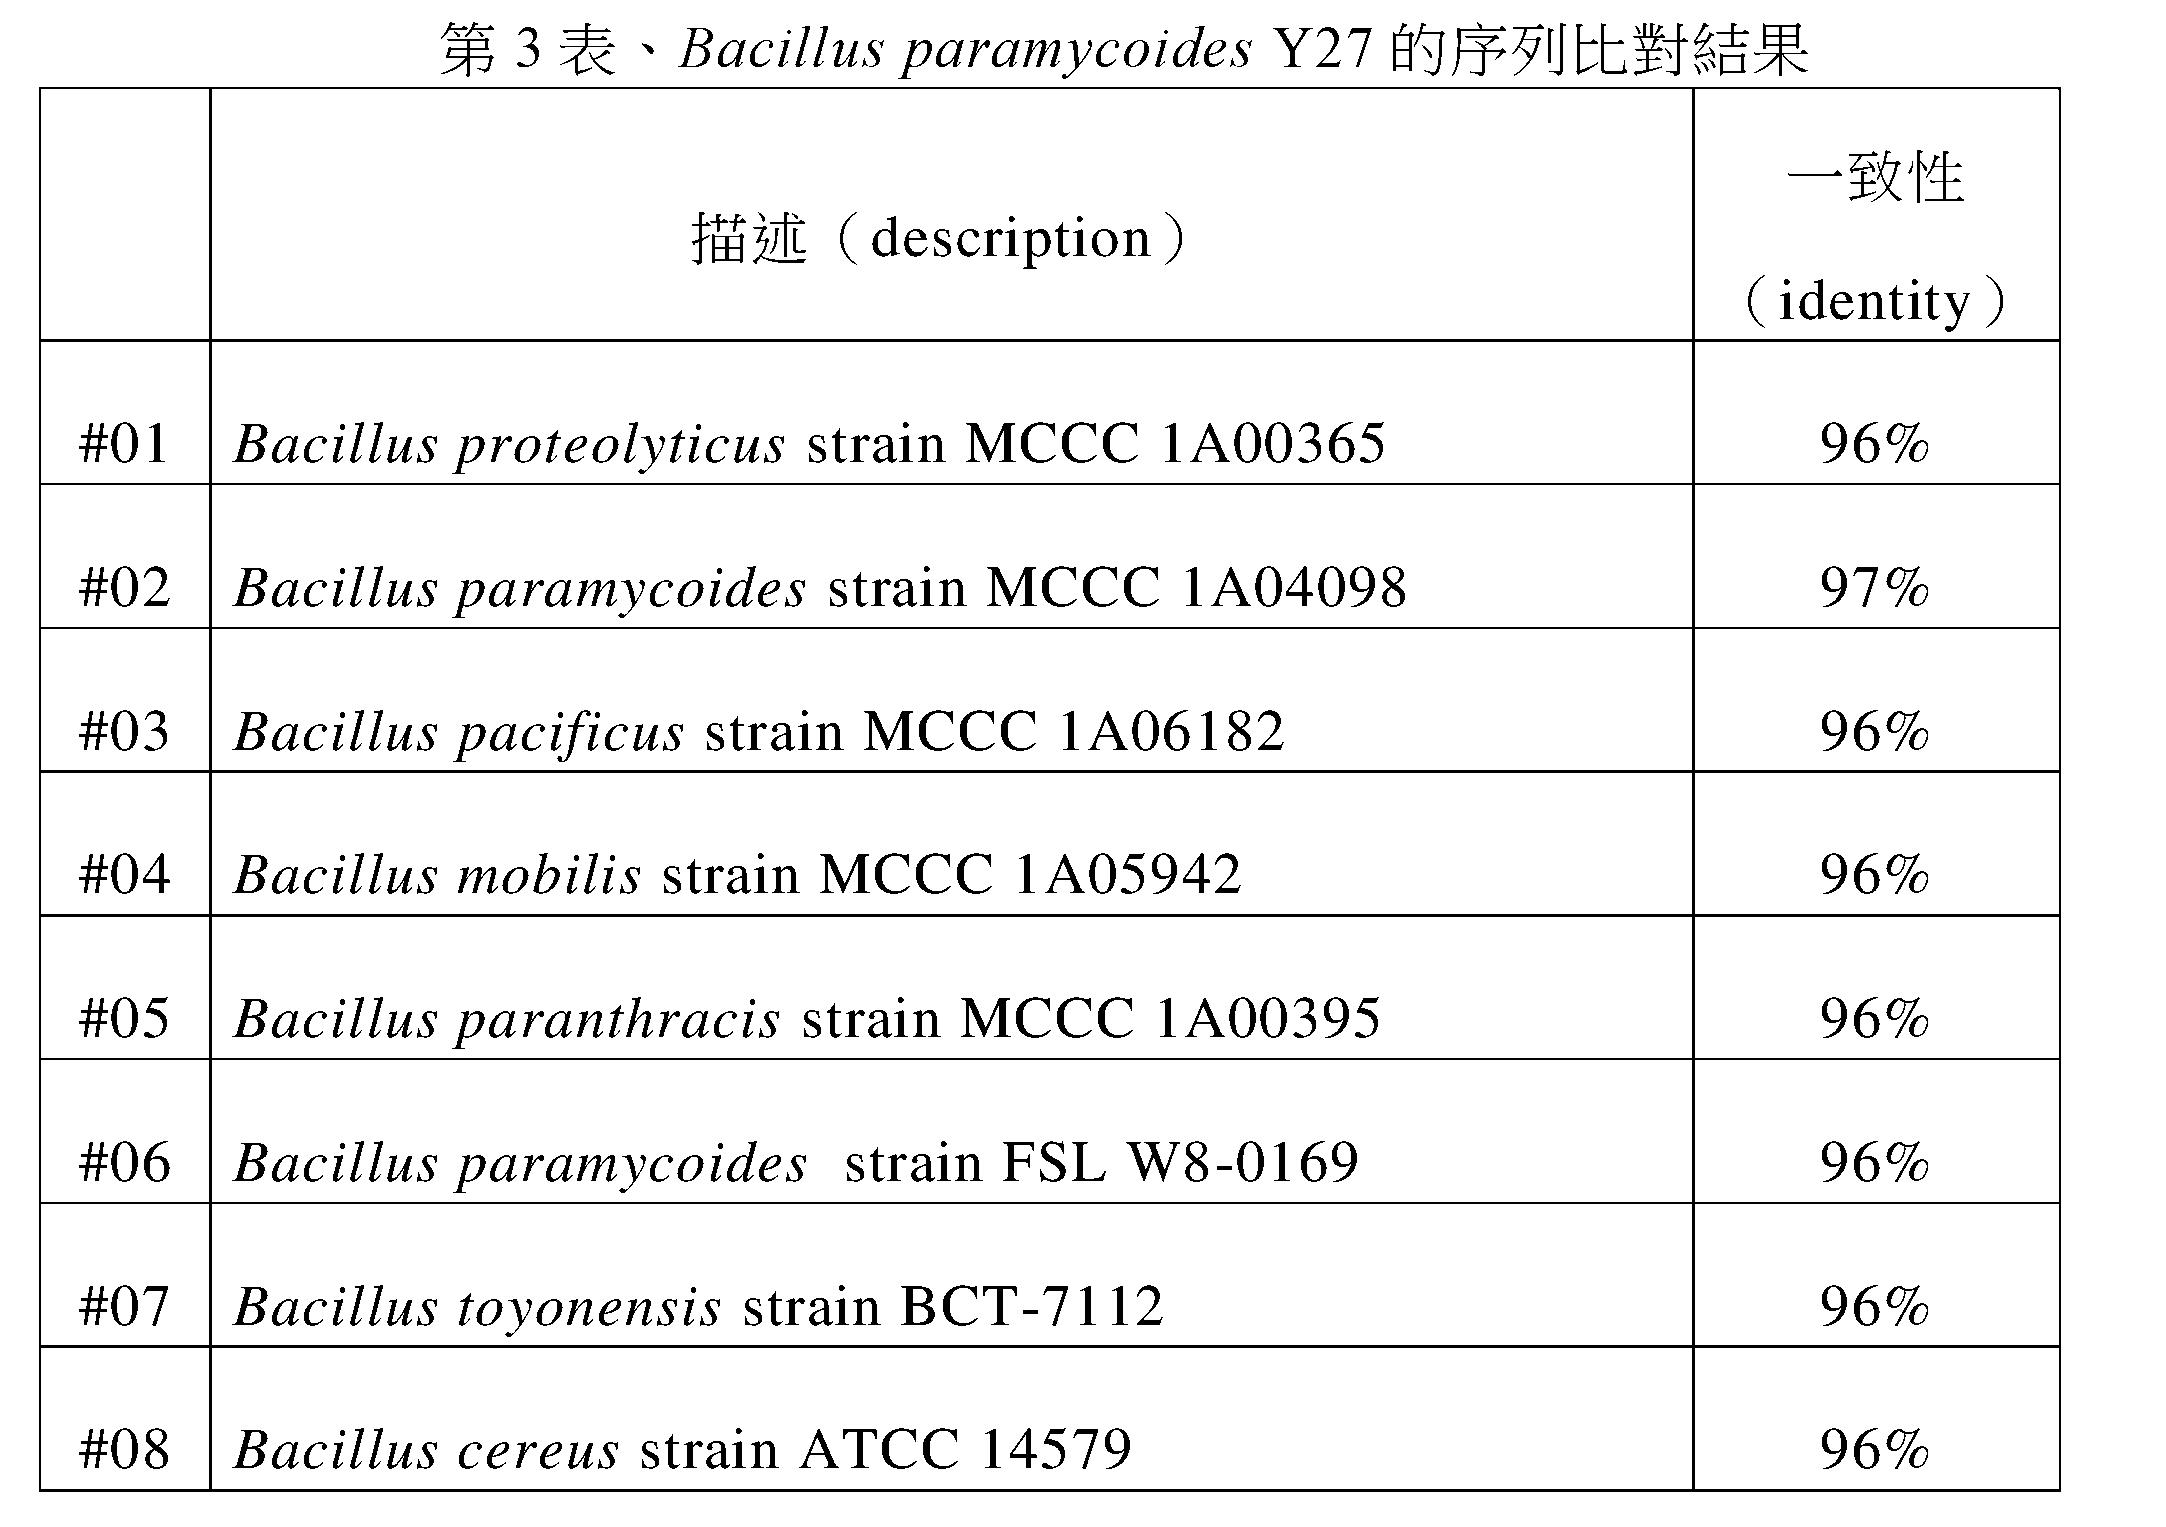 Figure 107145475-A0305-02-0007-6